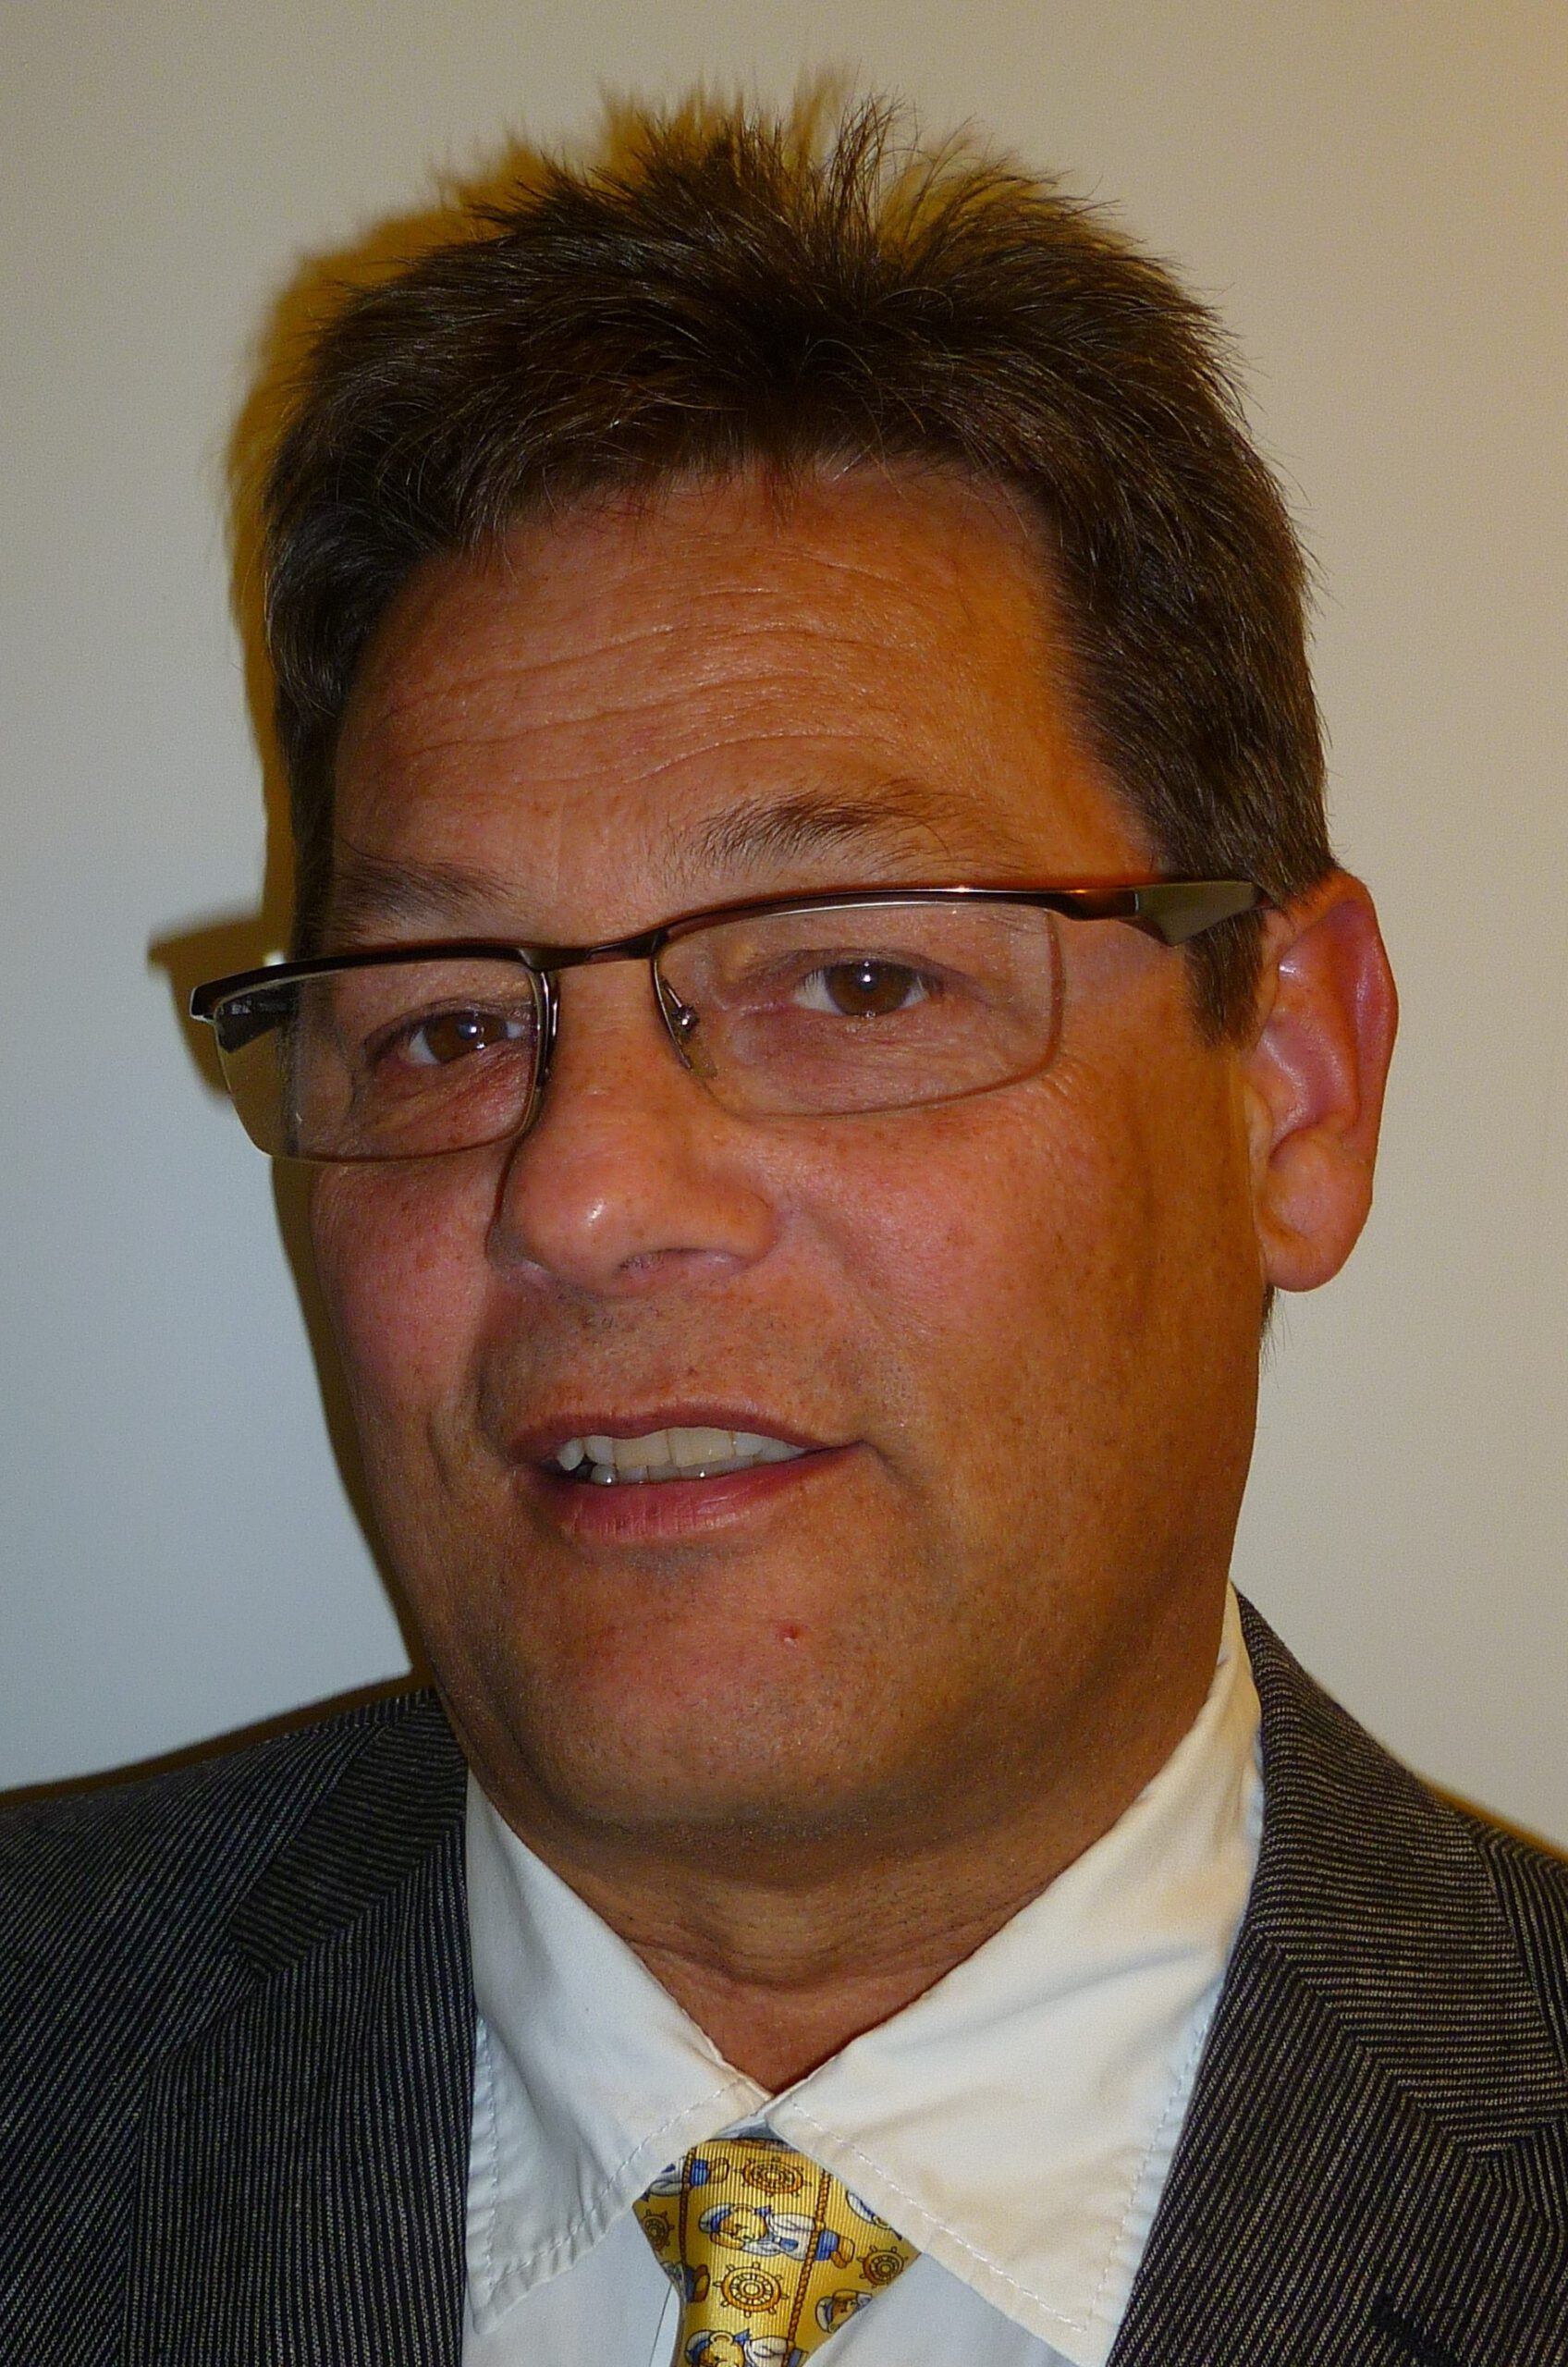 Christian Kühnel